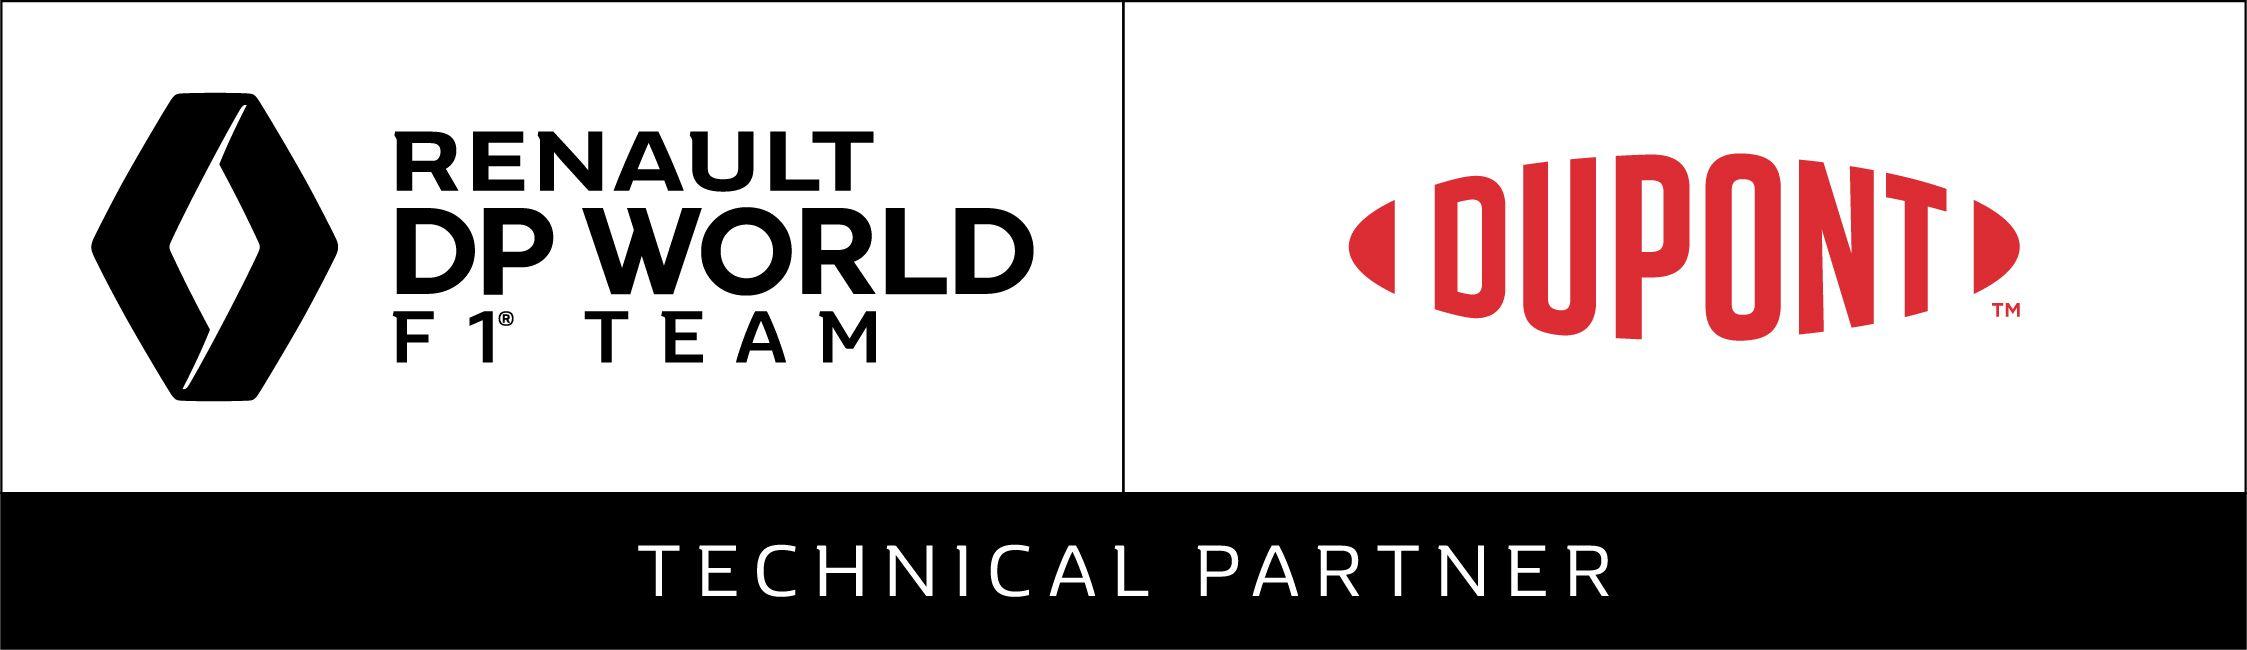 Dupont Technical Partner Logo Colour